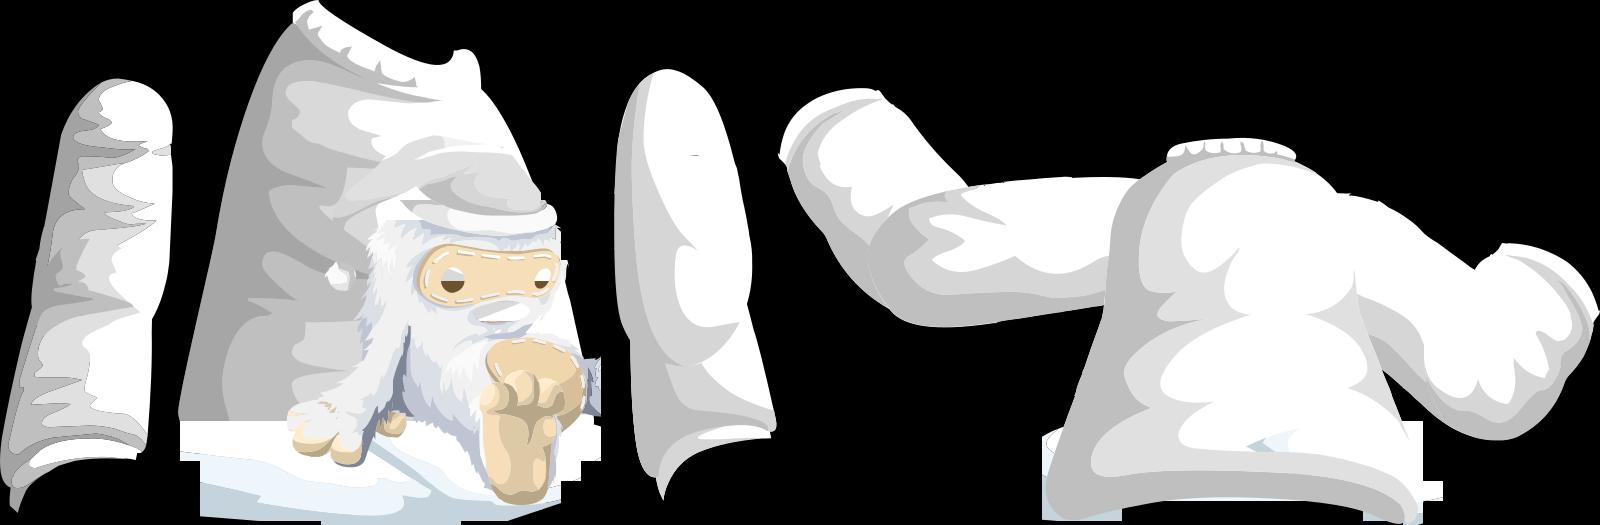 Blank T Shirt 2 SVG Clip arts